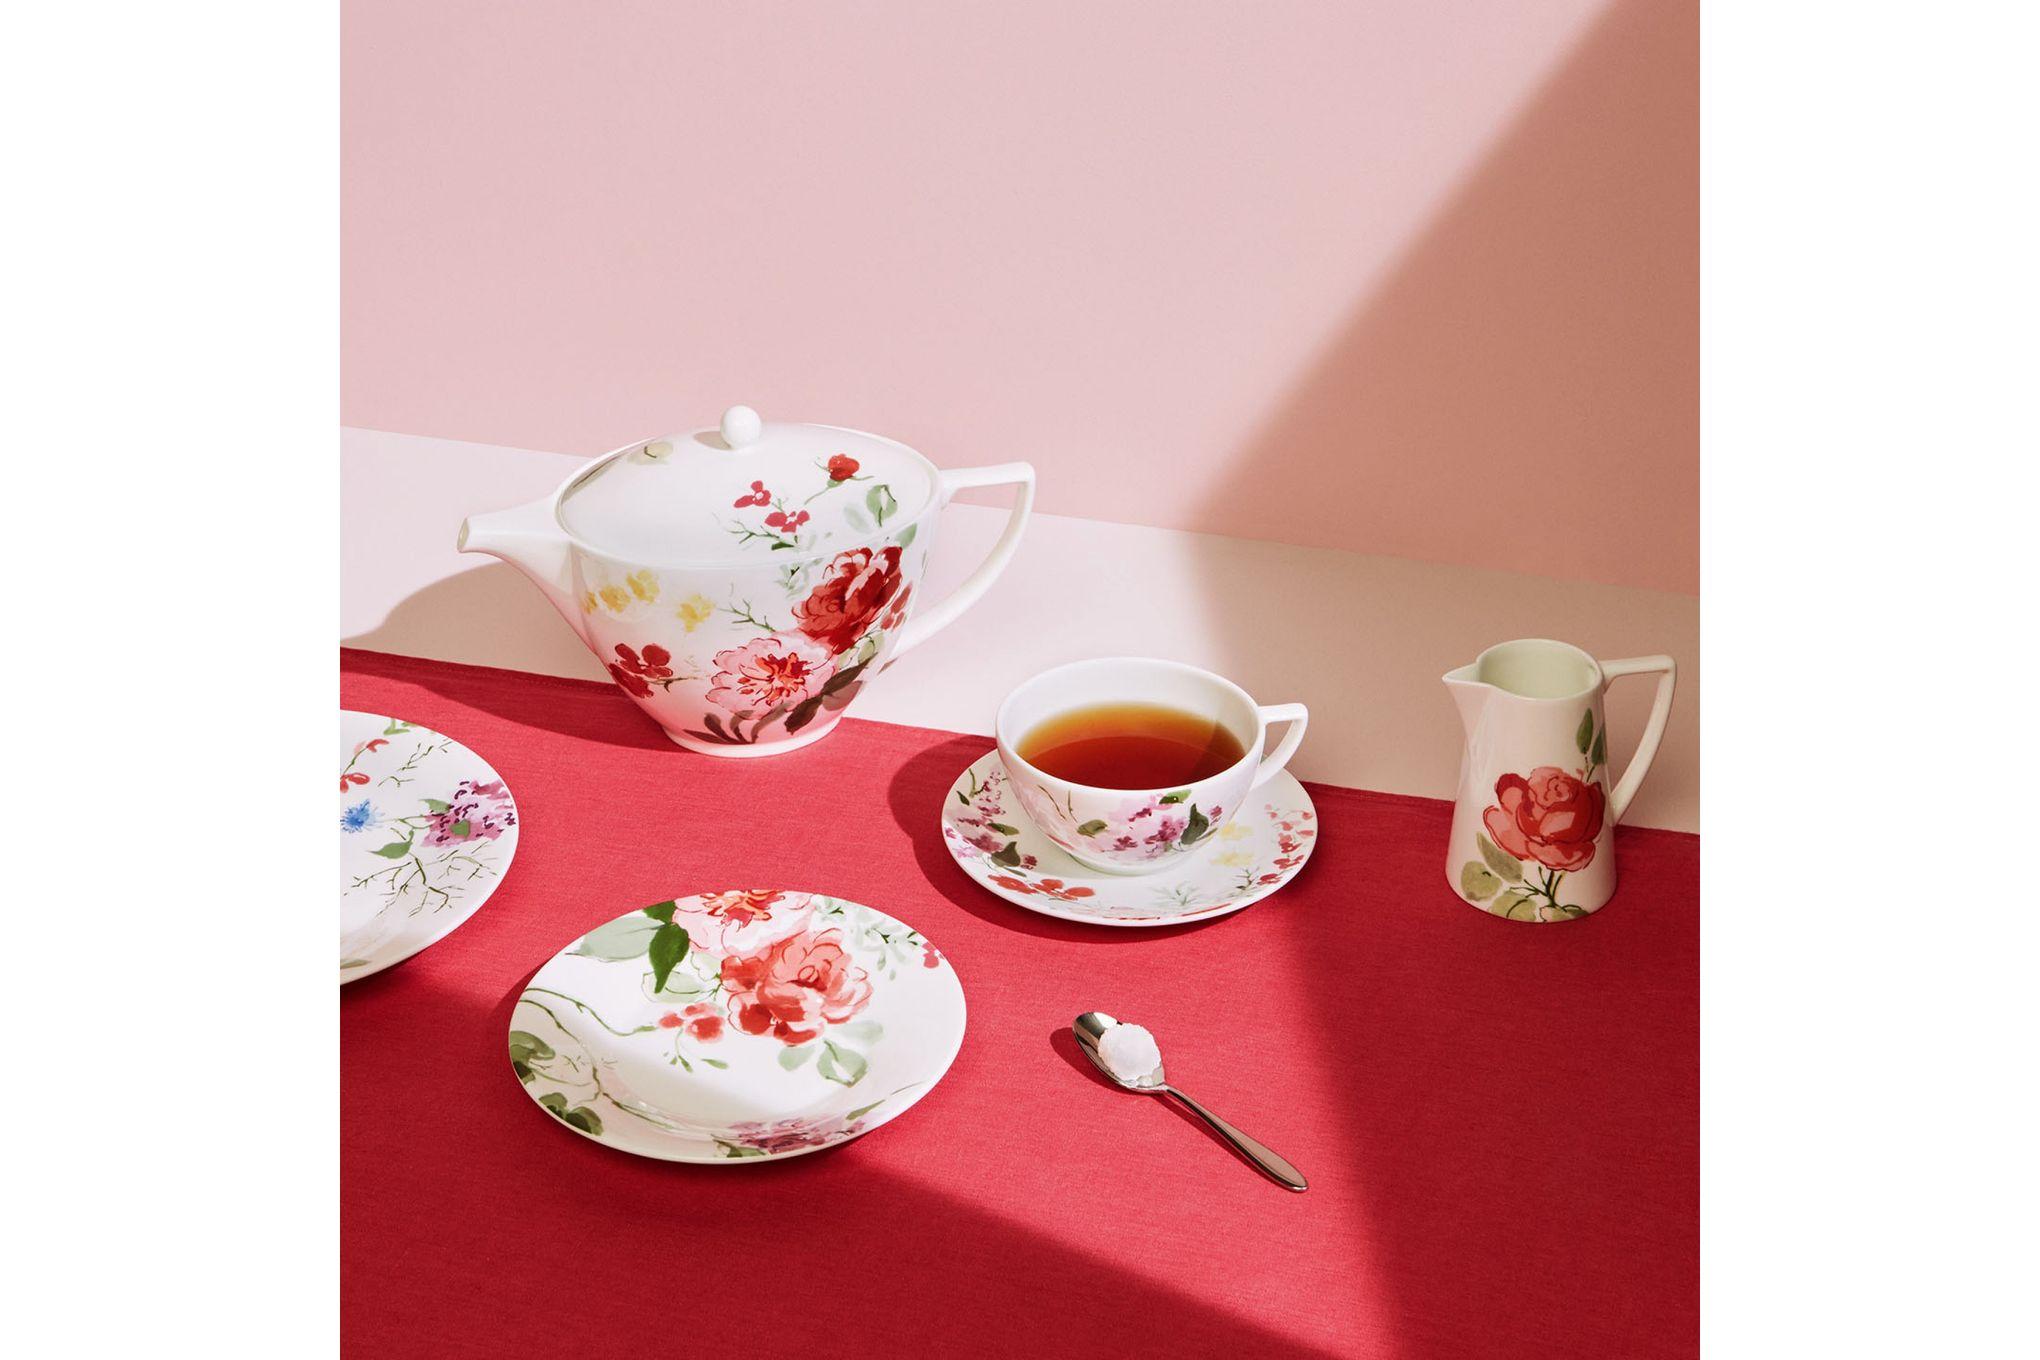 Jasper Conran for Wedgwood Floral Tea Saucer thumb 2